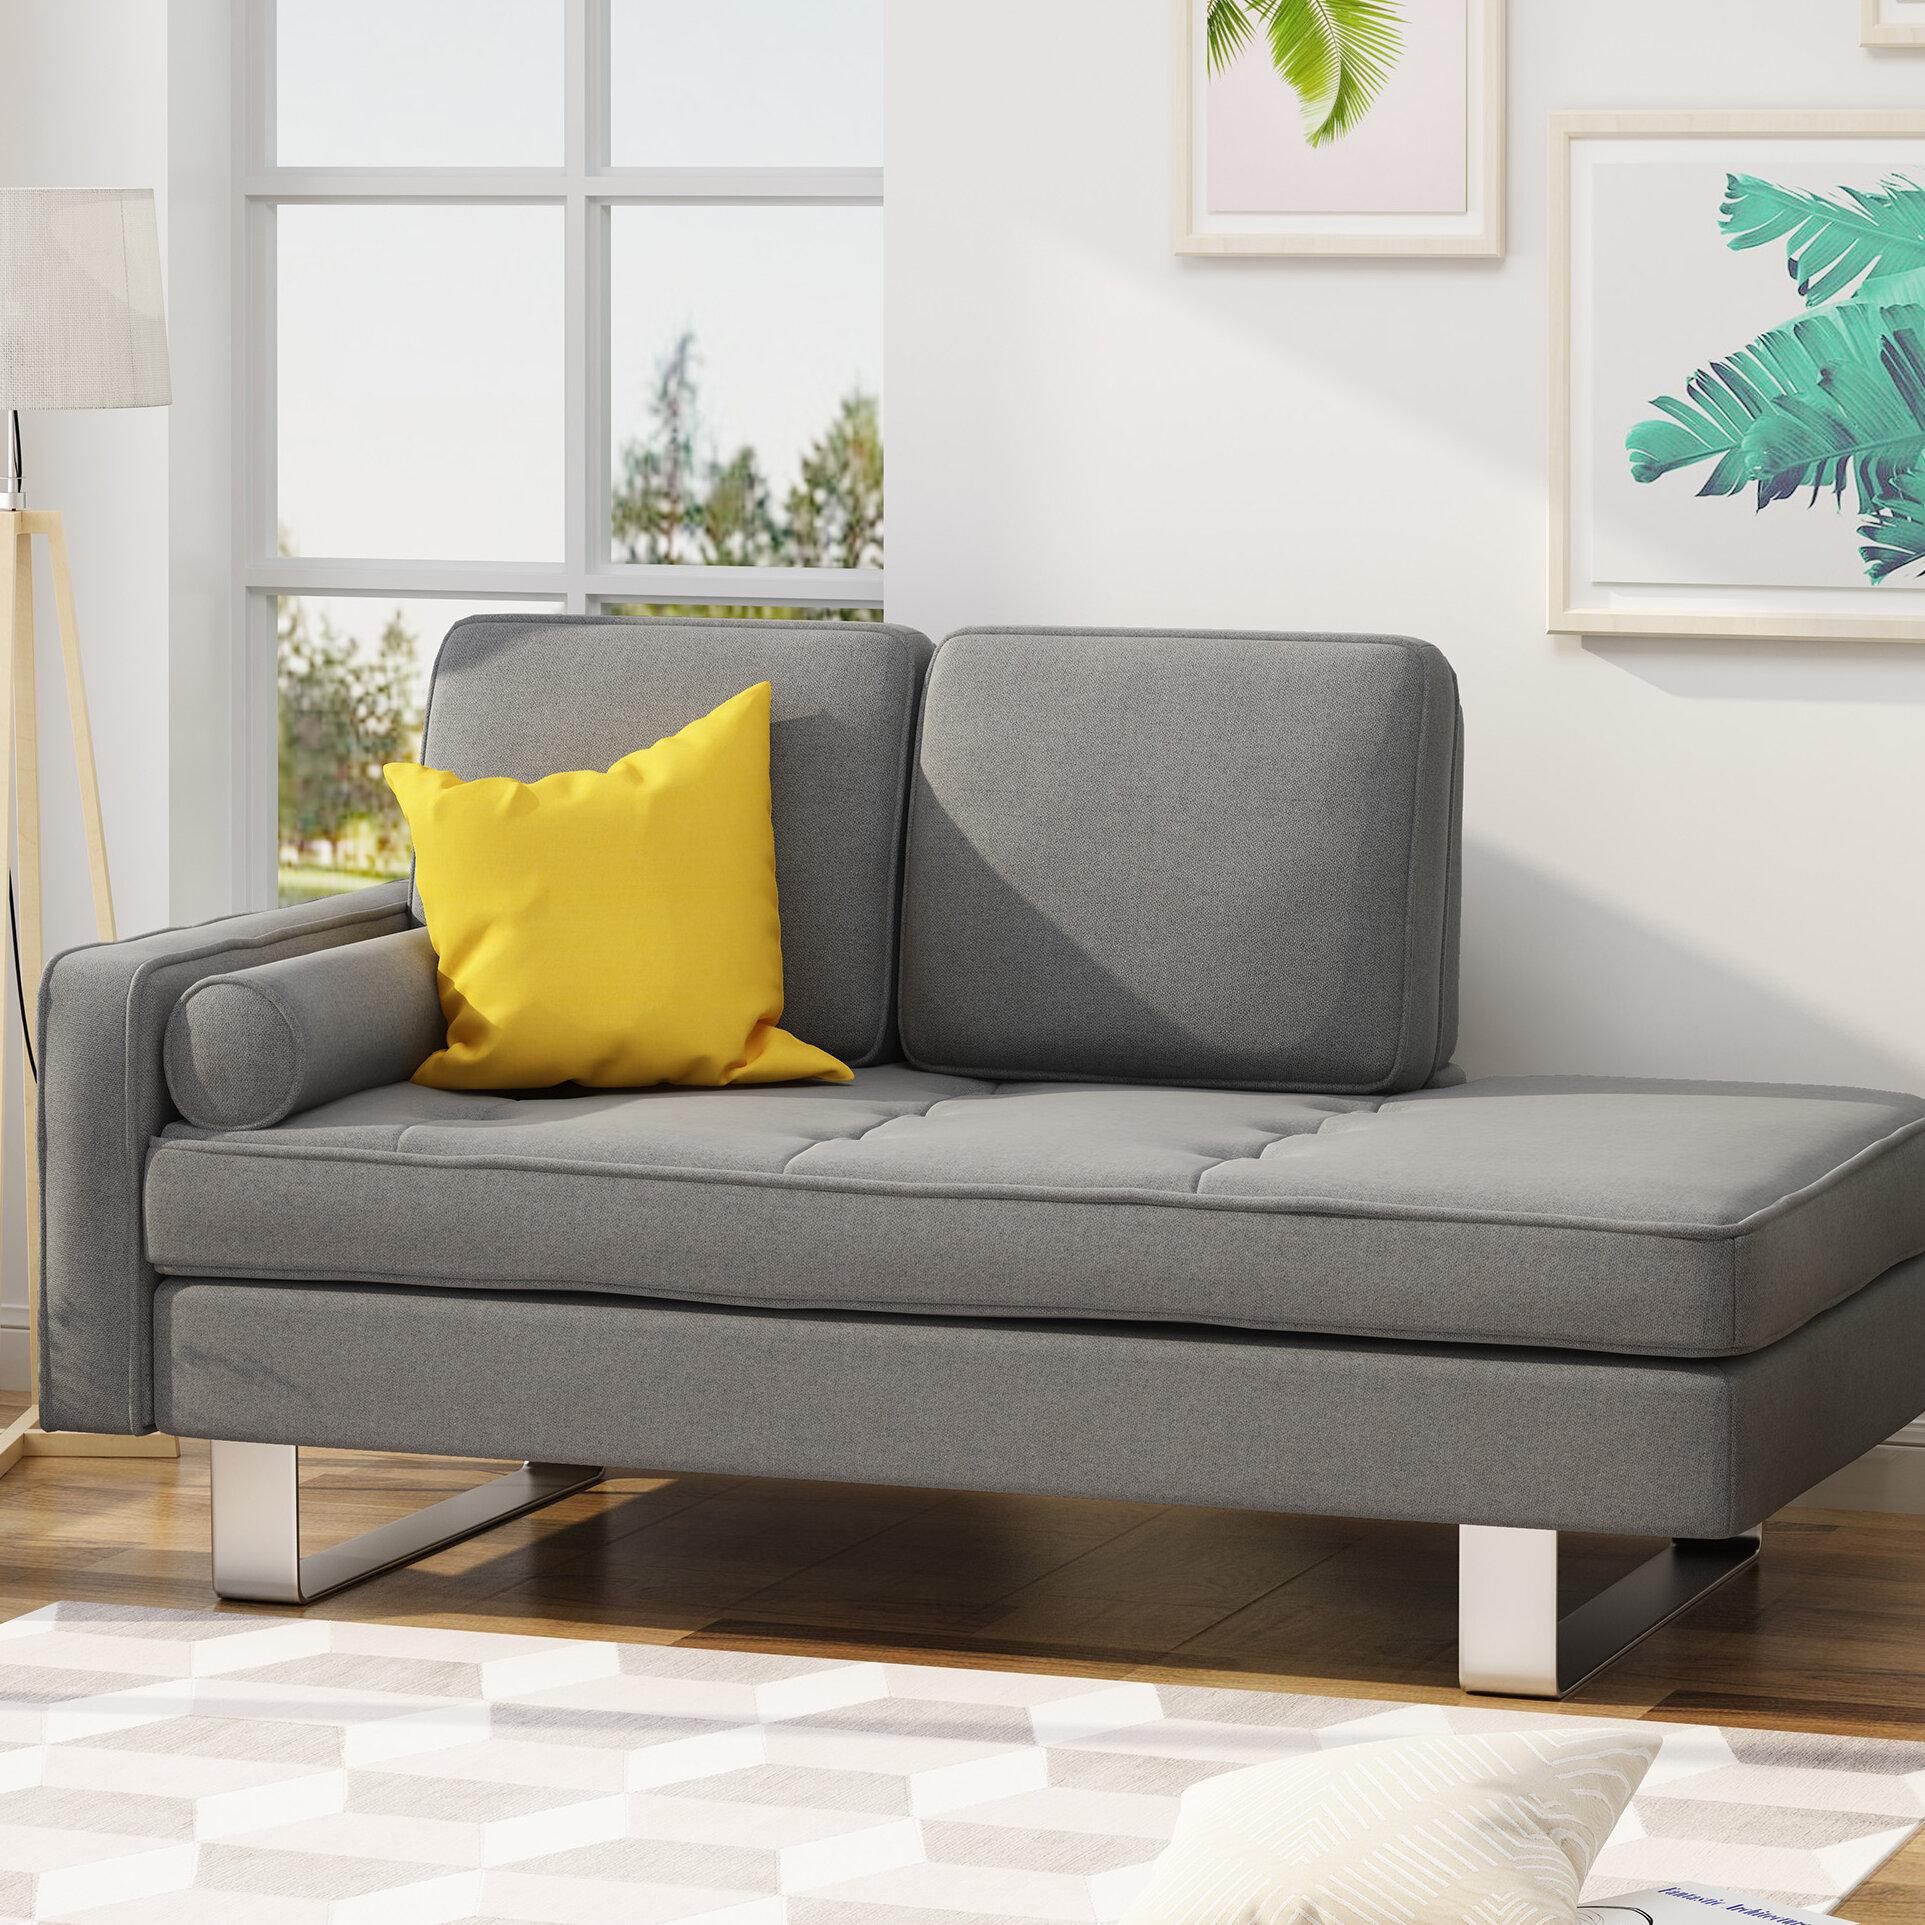 Orren Ellis Tess Chaise Lounge